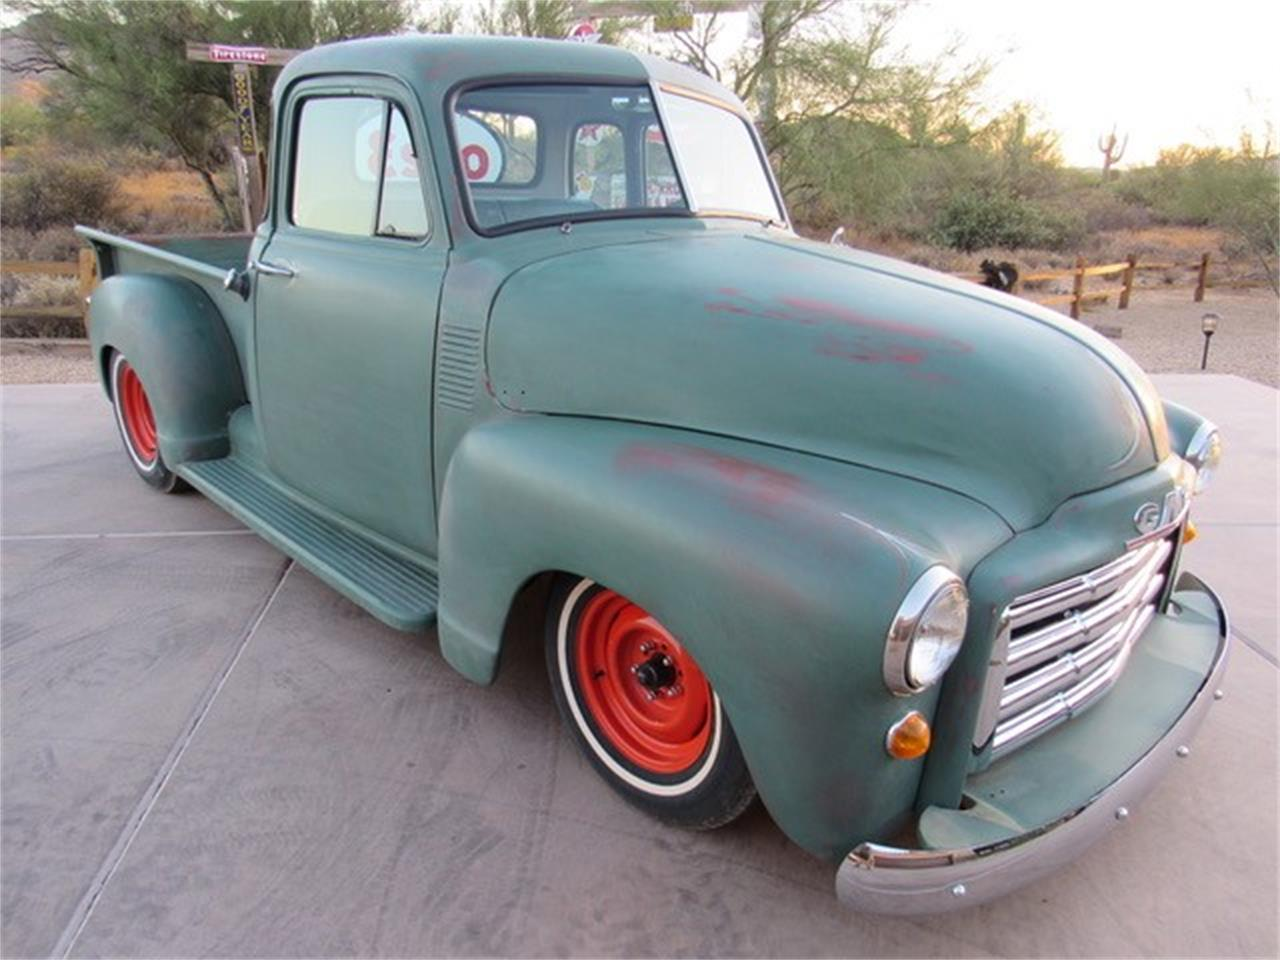 1951 Gmc 5 Window Pickup For Sale Classiccars Com Cc 1056361